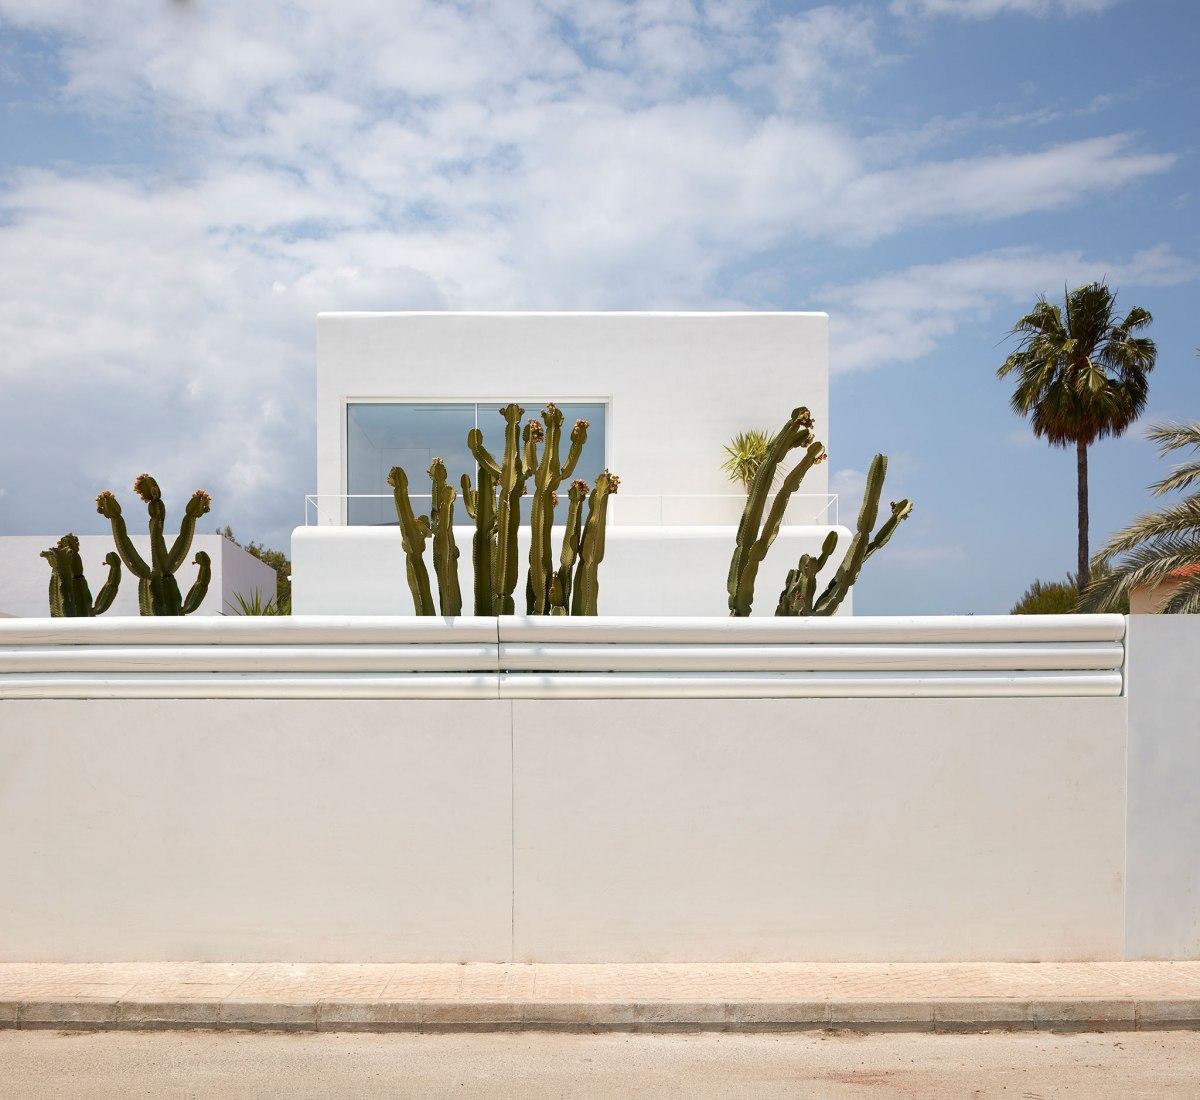 Casa Carmen por Carles Faus Arquitectura. Fotografía por Mariela Apollonio